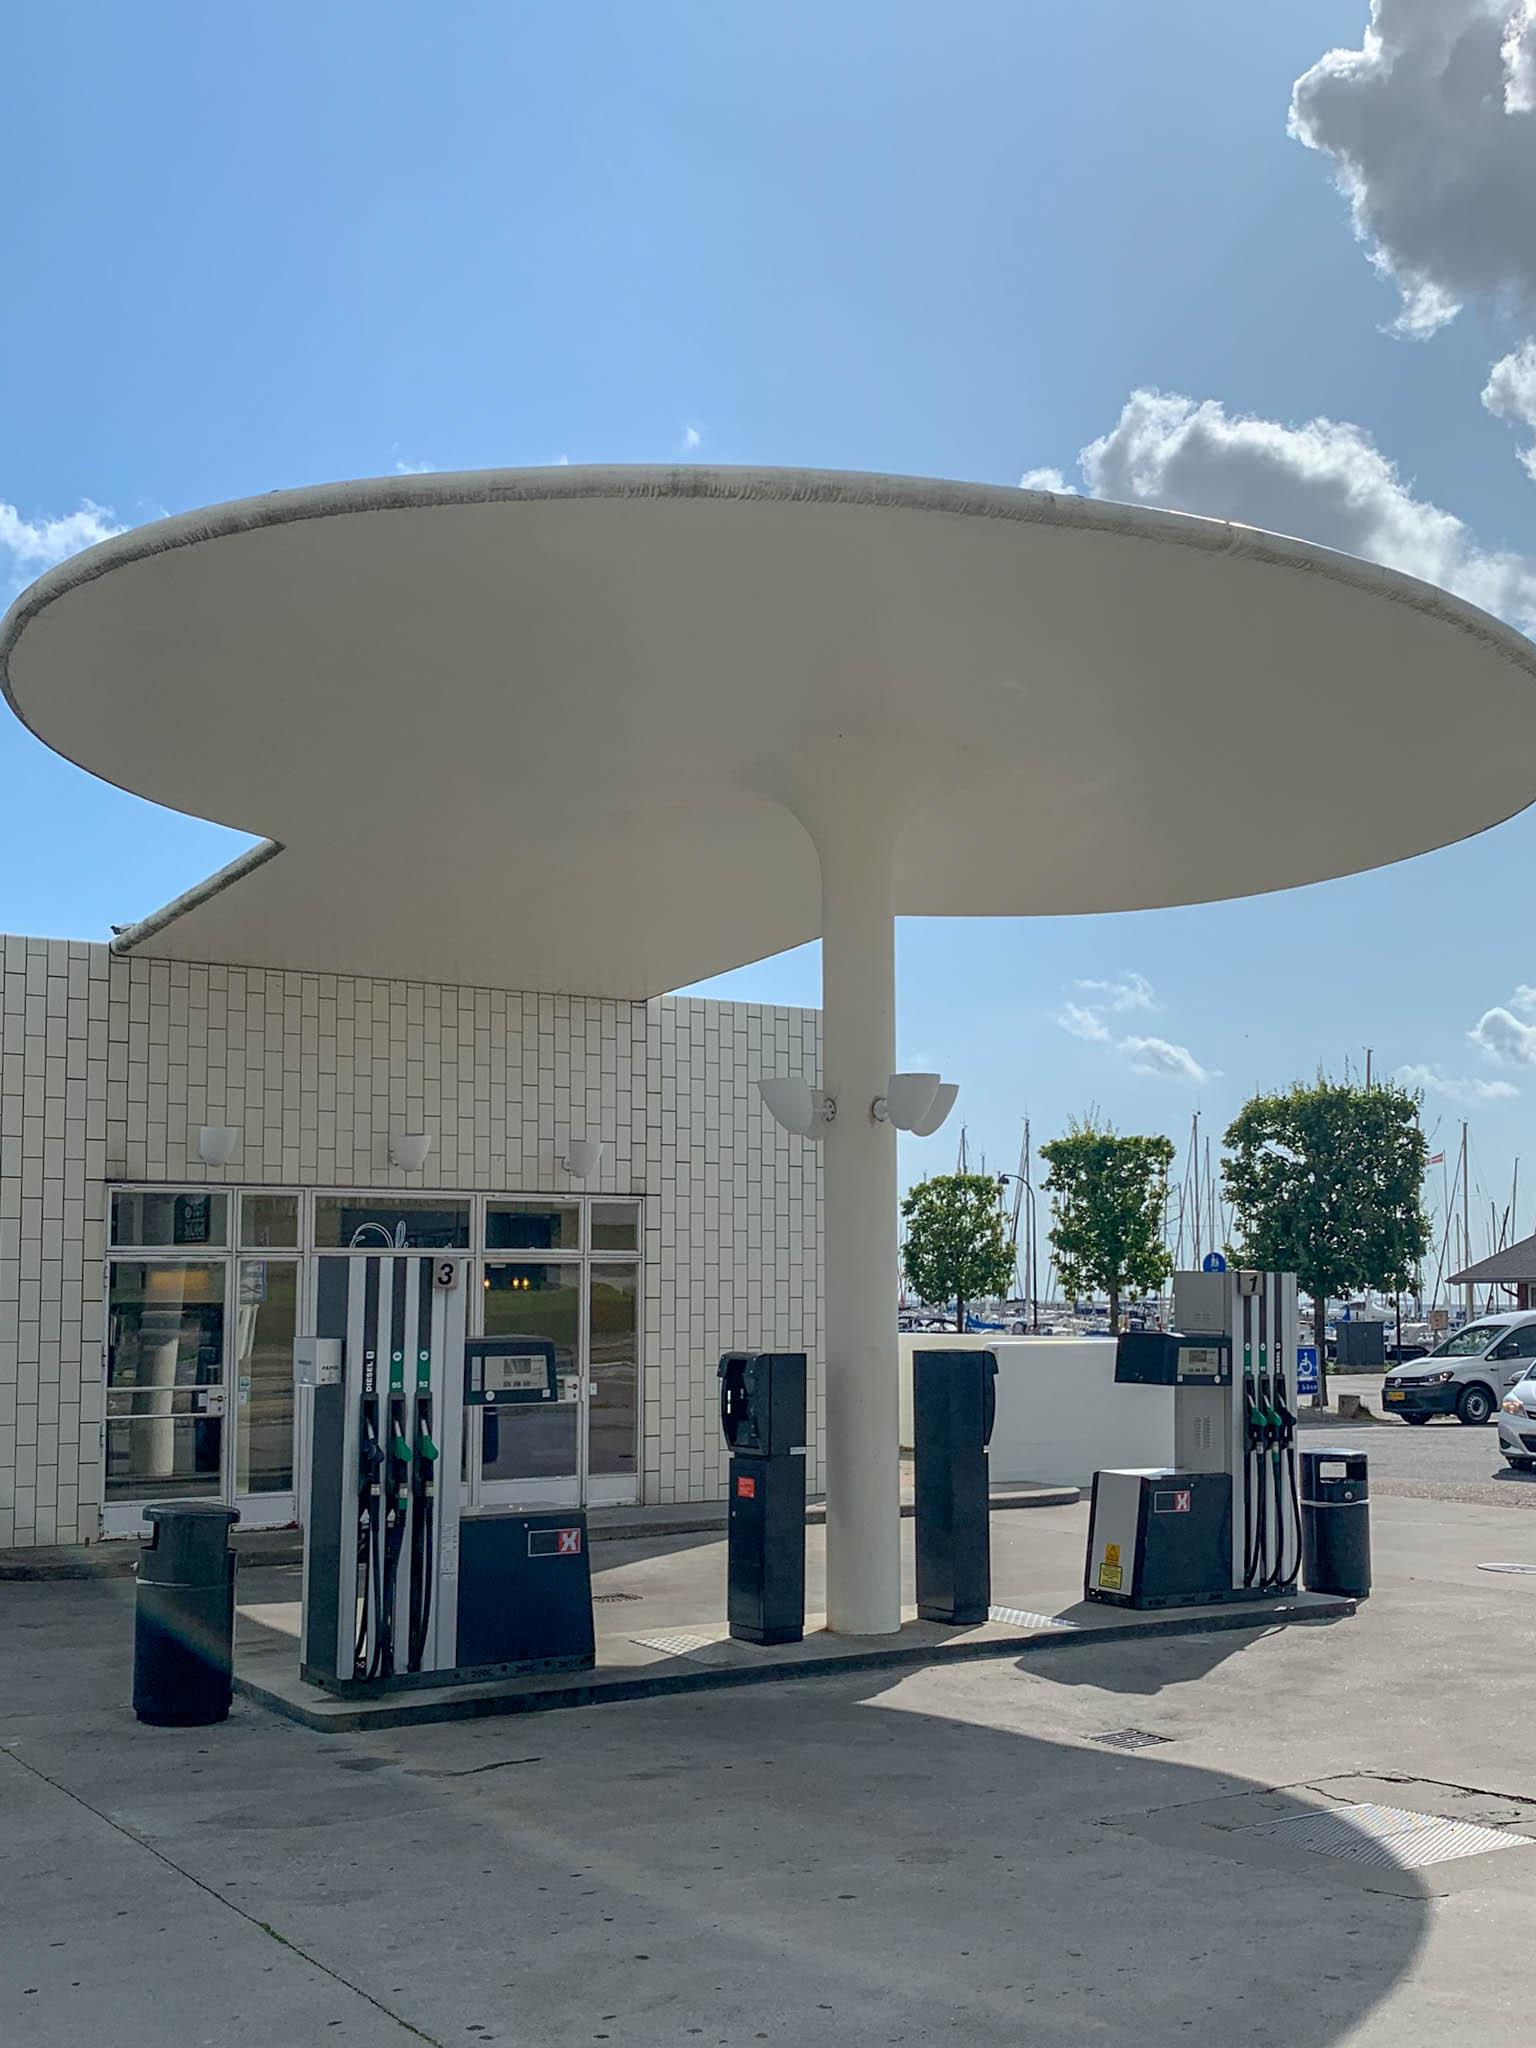 Skovshoved Petrol Station, 1936. Architect: Arne Jacobsen